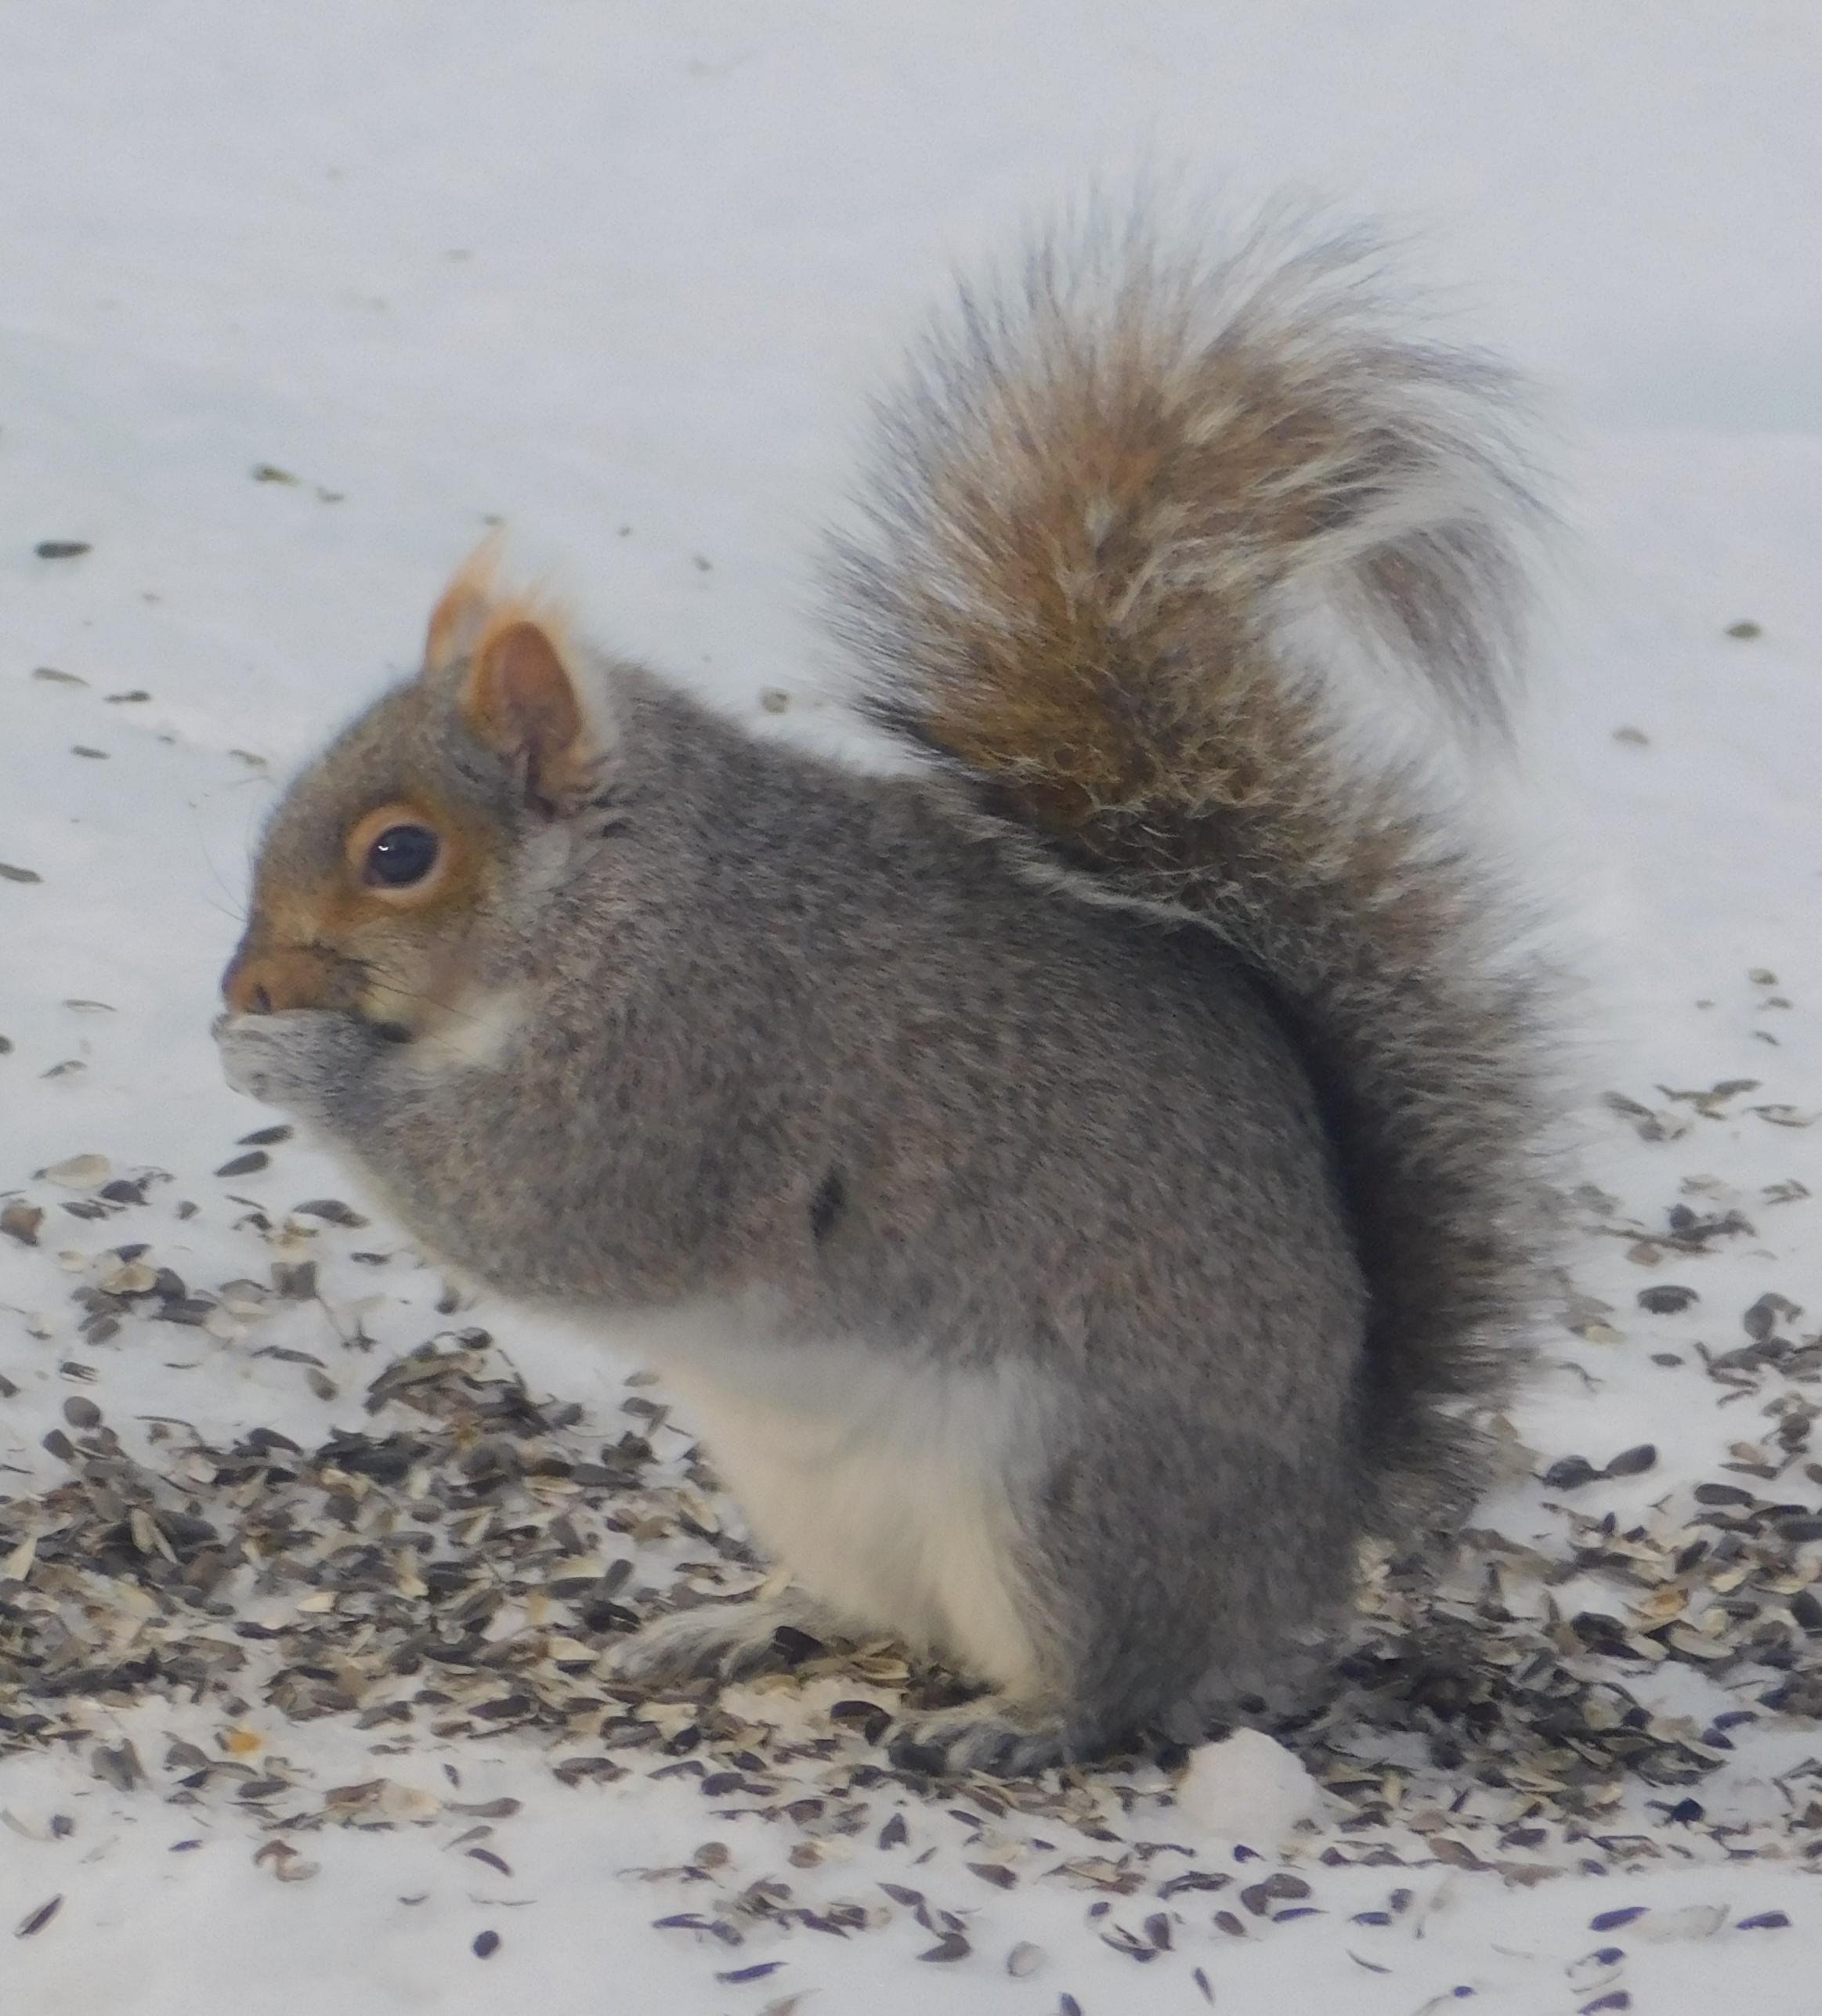 squirrel as a vector